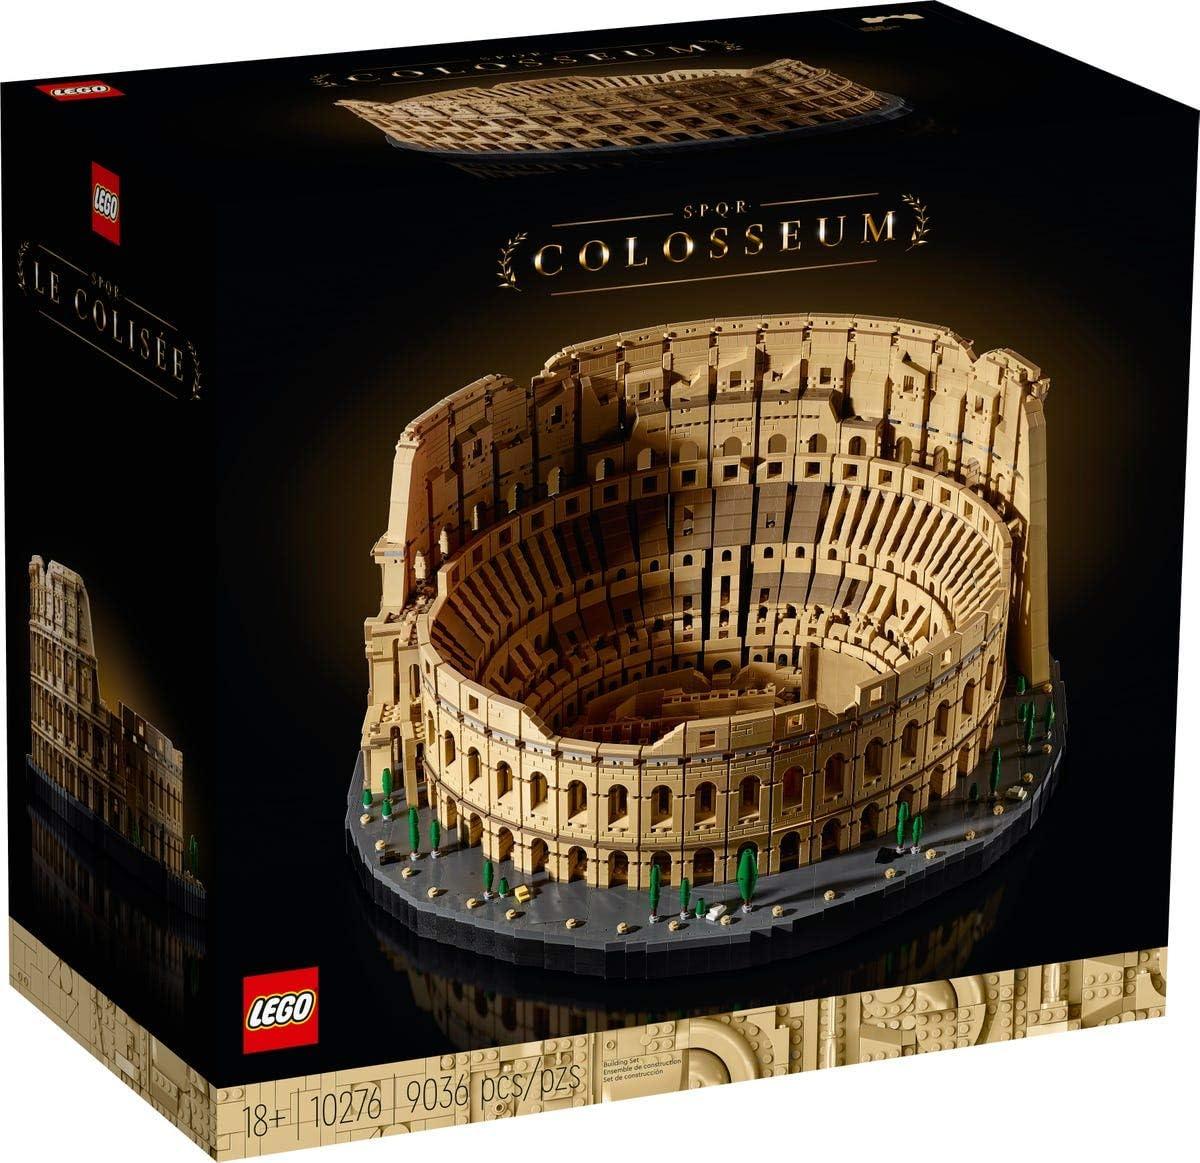 LEGO Free Shipping National uniform free shipping New Creator Expert Colosseum 9036pcs 10276